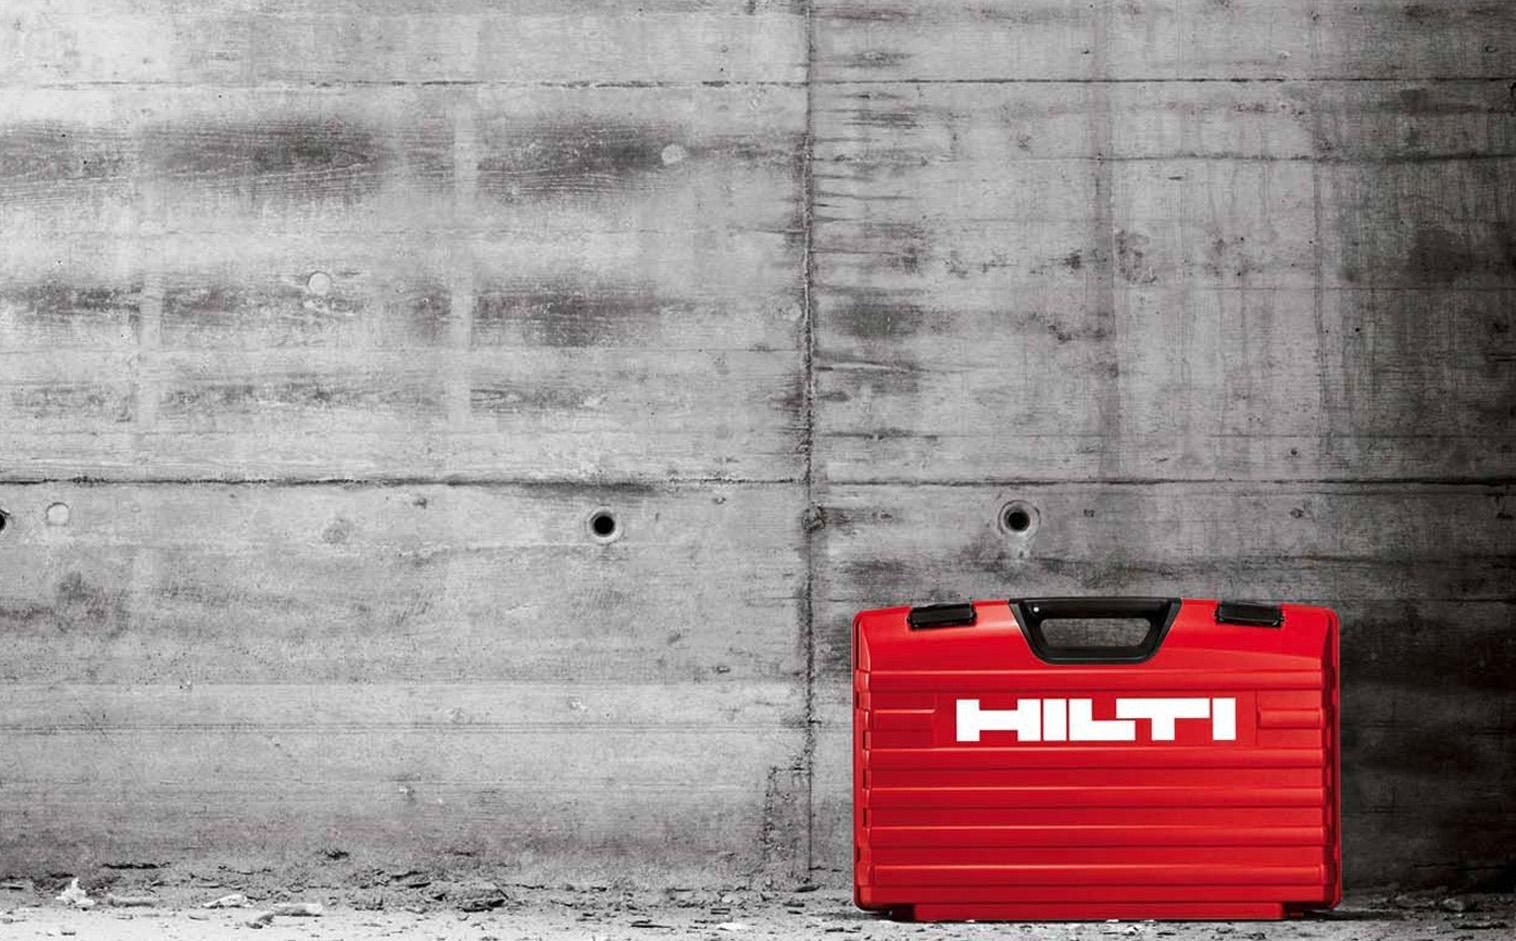 hilti-OFG-advertising-marketing-blog-SEO.jpg